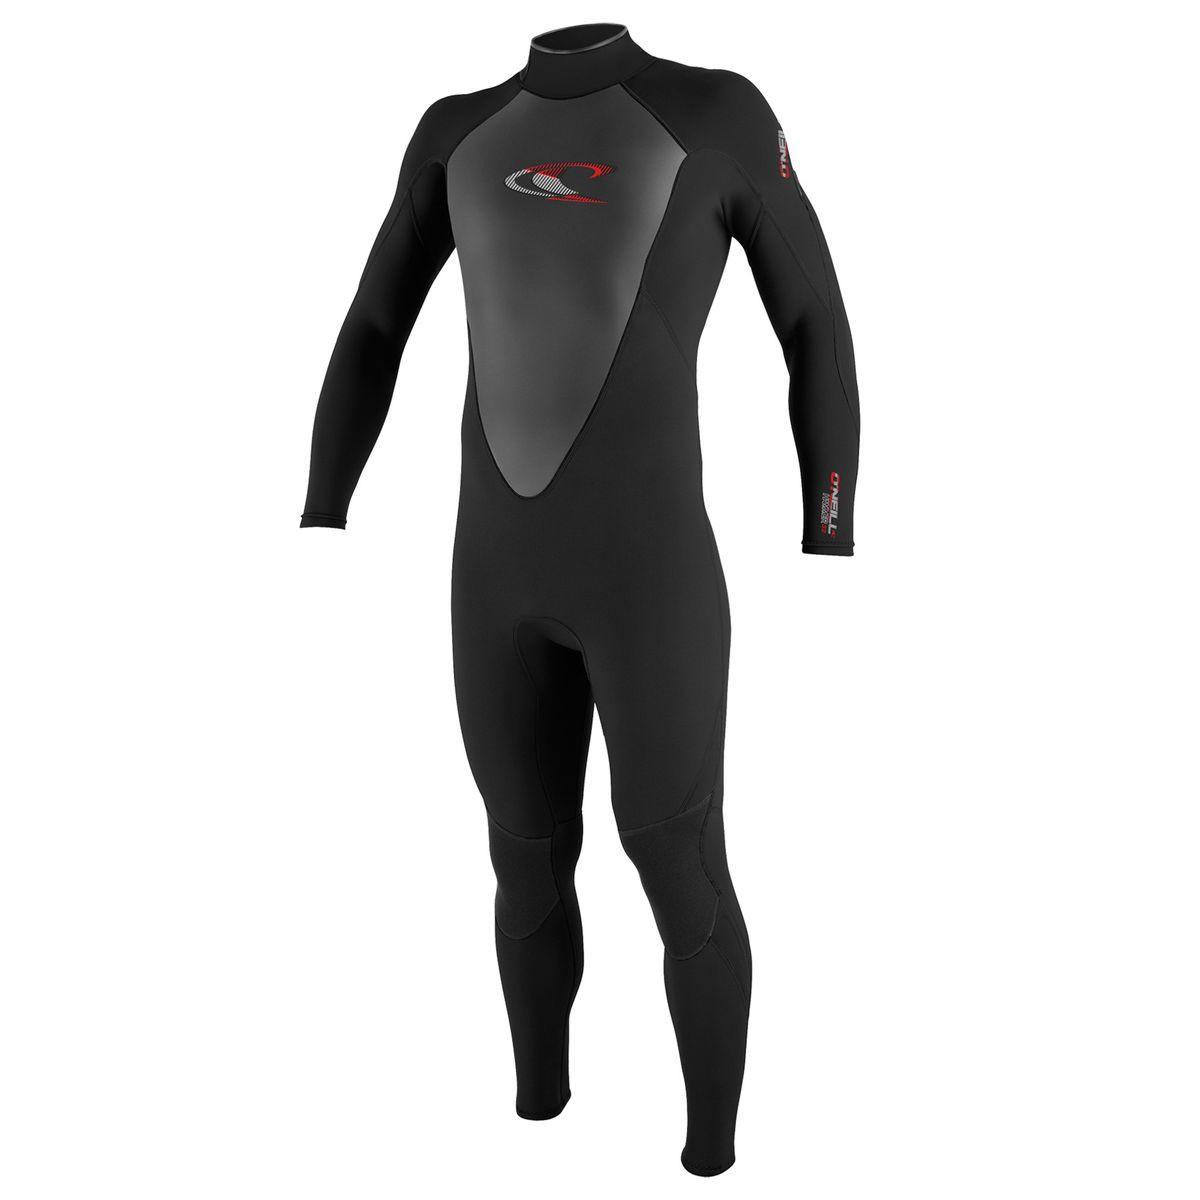 O'Neill Hammer 3/2mm Back Zip Wetsuit - Black/Black/Black